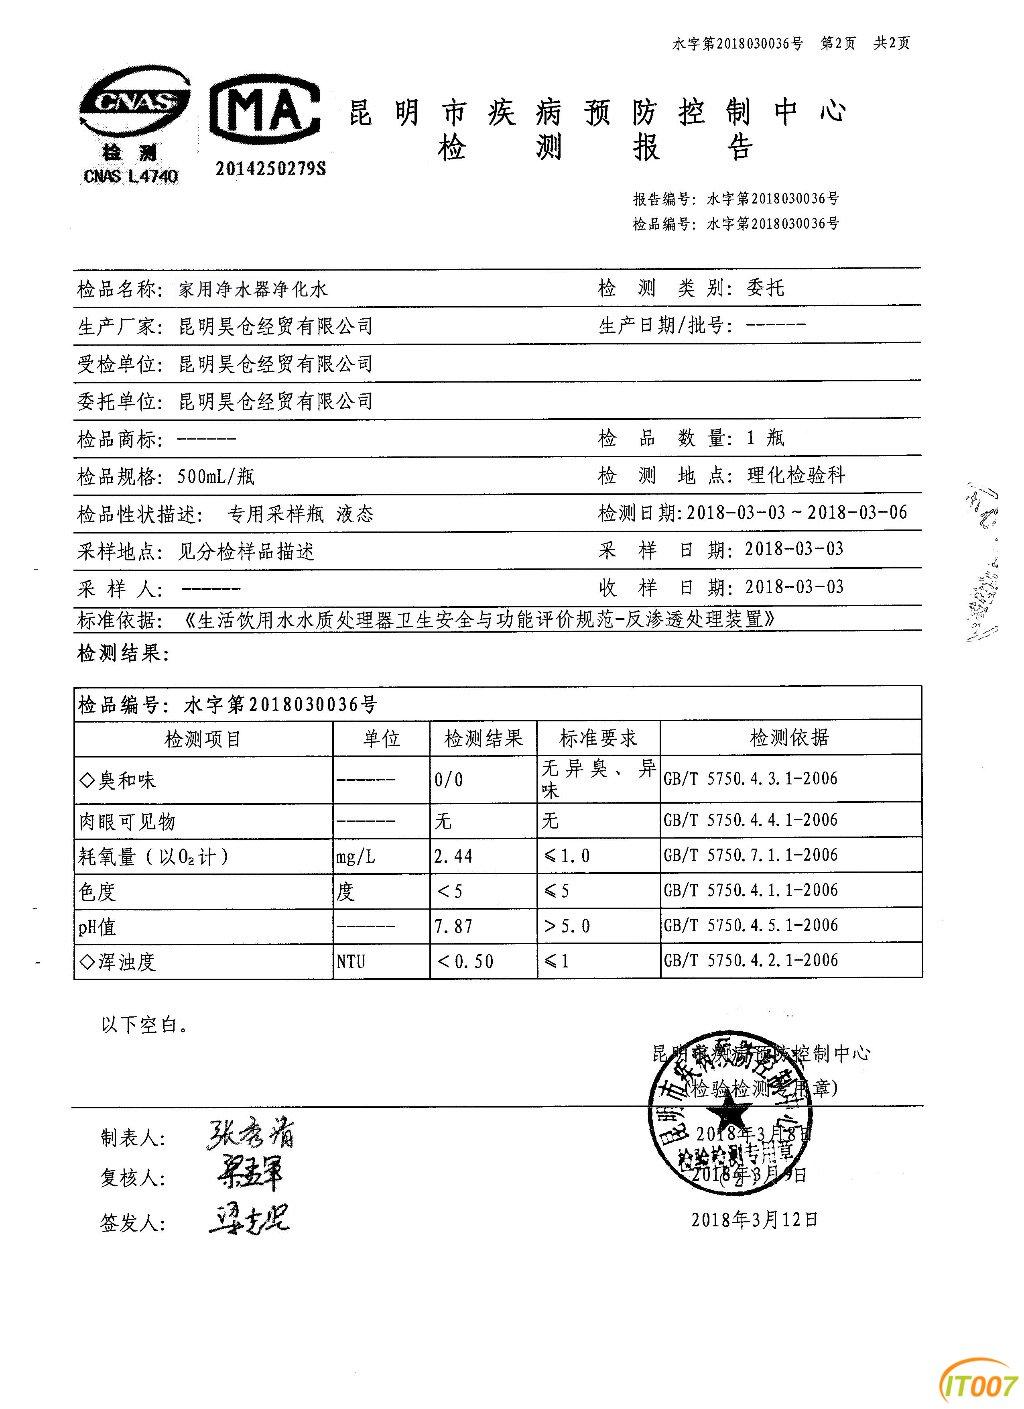 3F196ECC-13C1-433E-B862-A3240287443F.jpeg